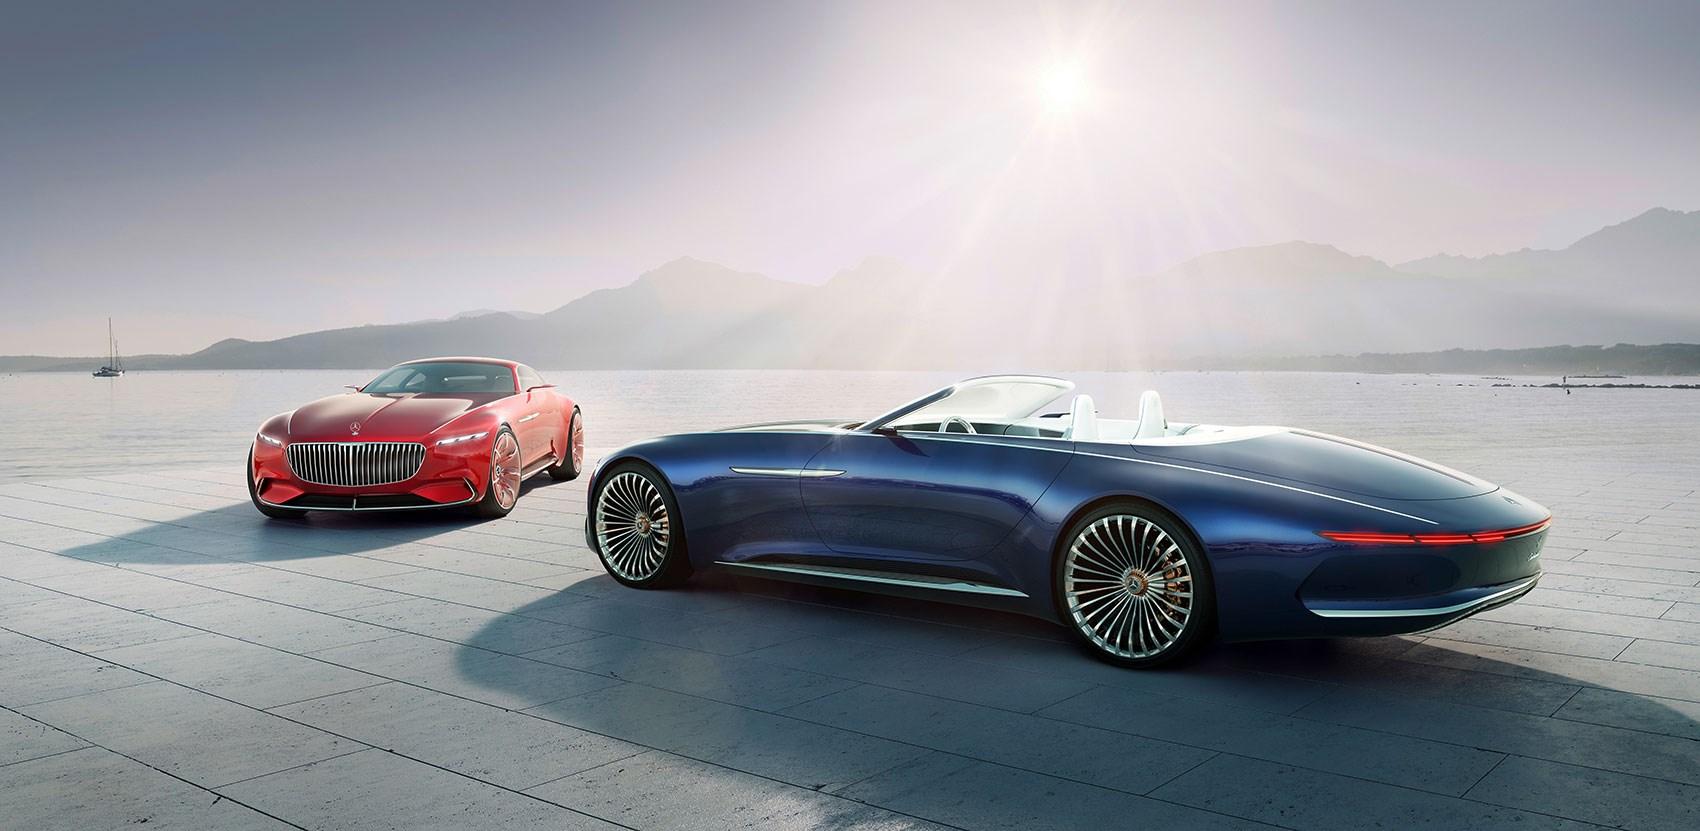 Maybach maybach benz : Vision Mercedes-Maybach 6 Cabriolet: news, photos, specs by CAR ...